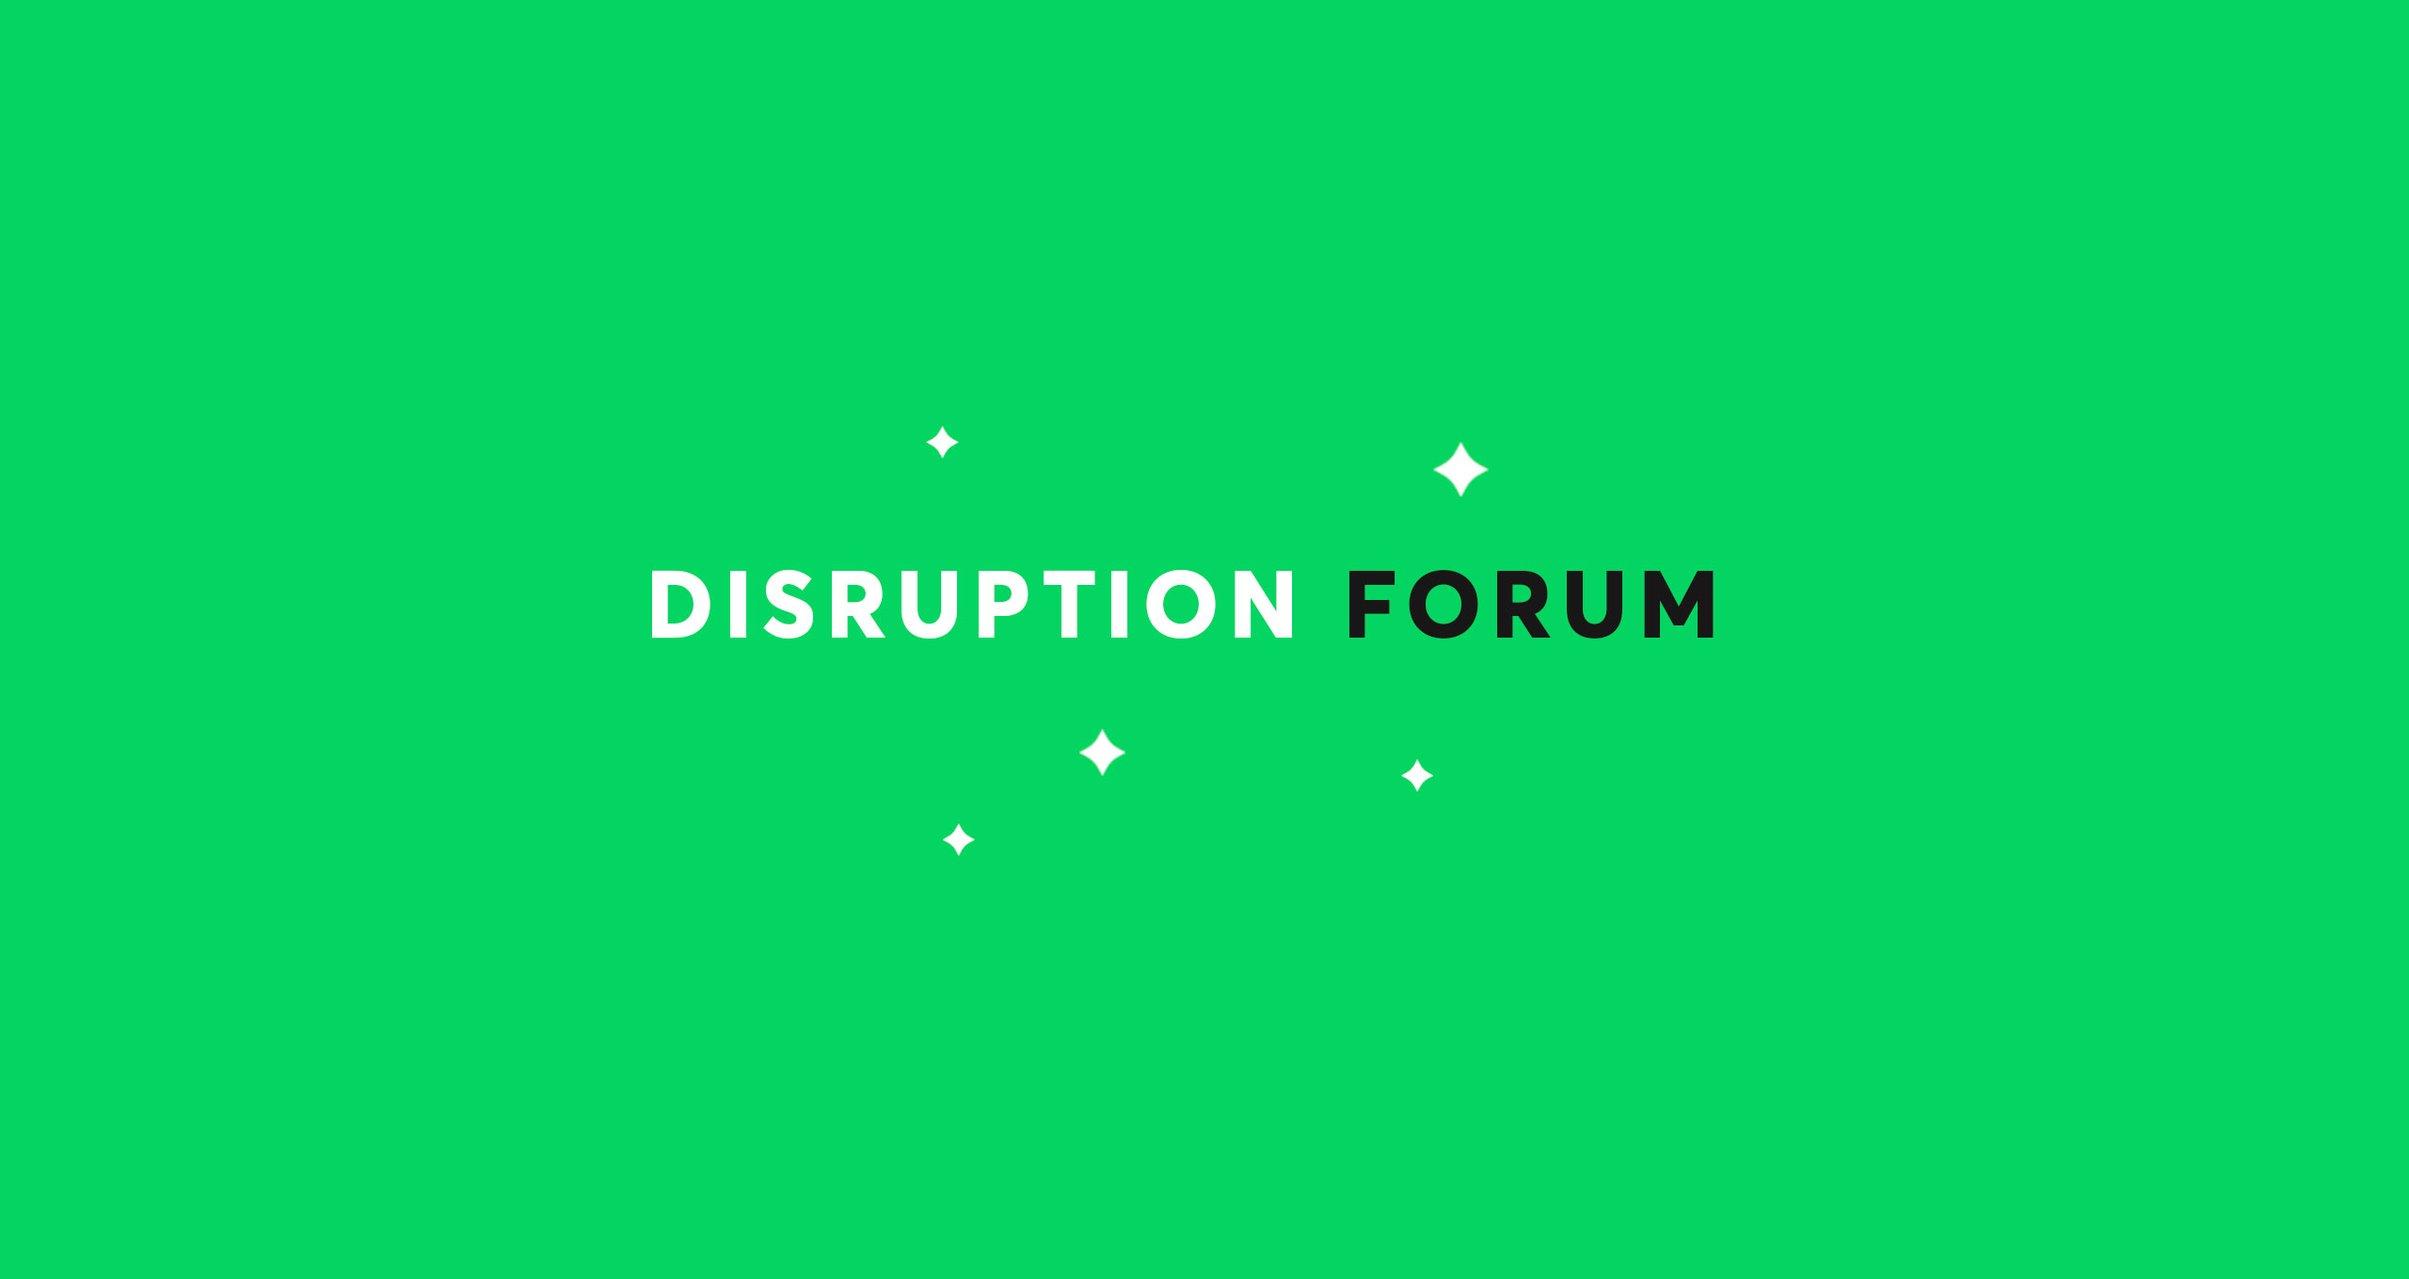 disruption forum remote